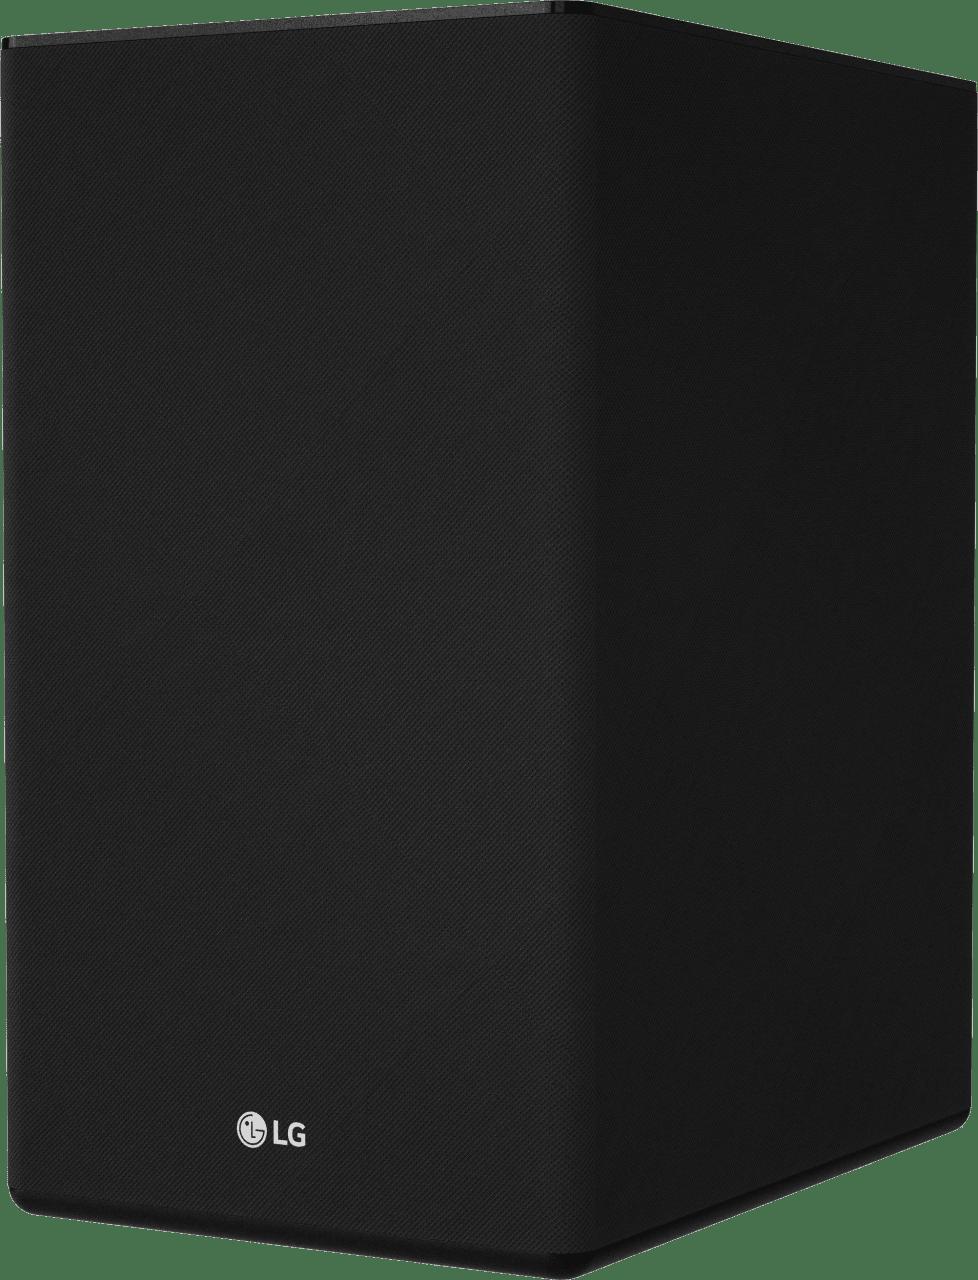 Dark Steel Silver LG DSN9YG Soundbar.2